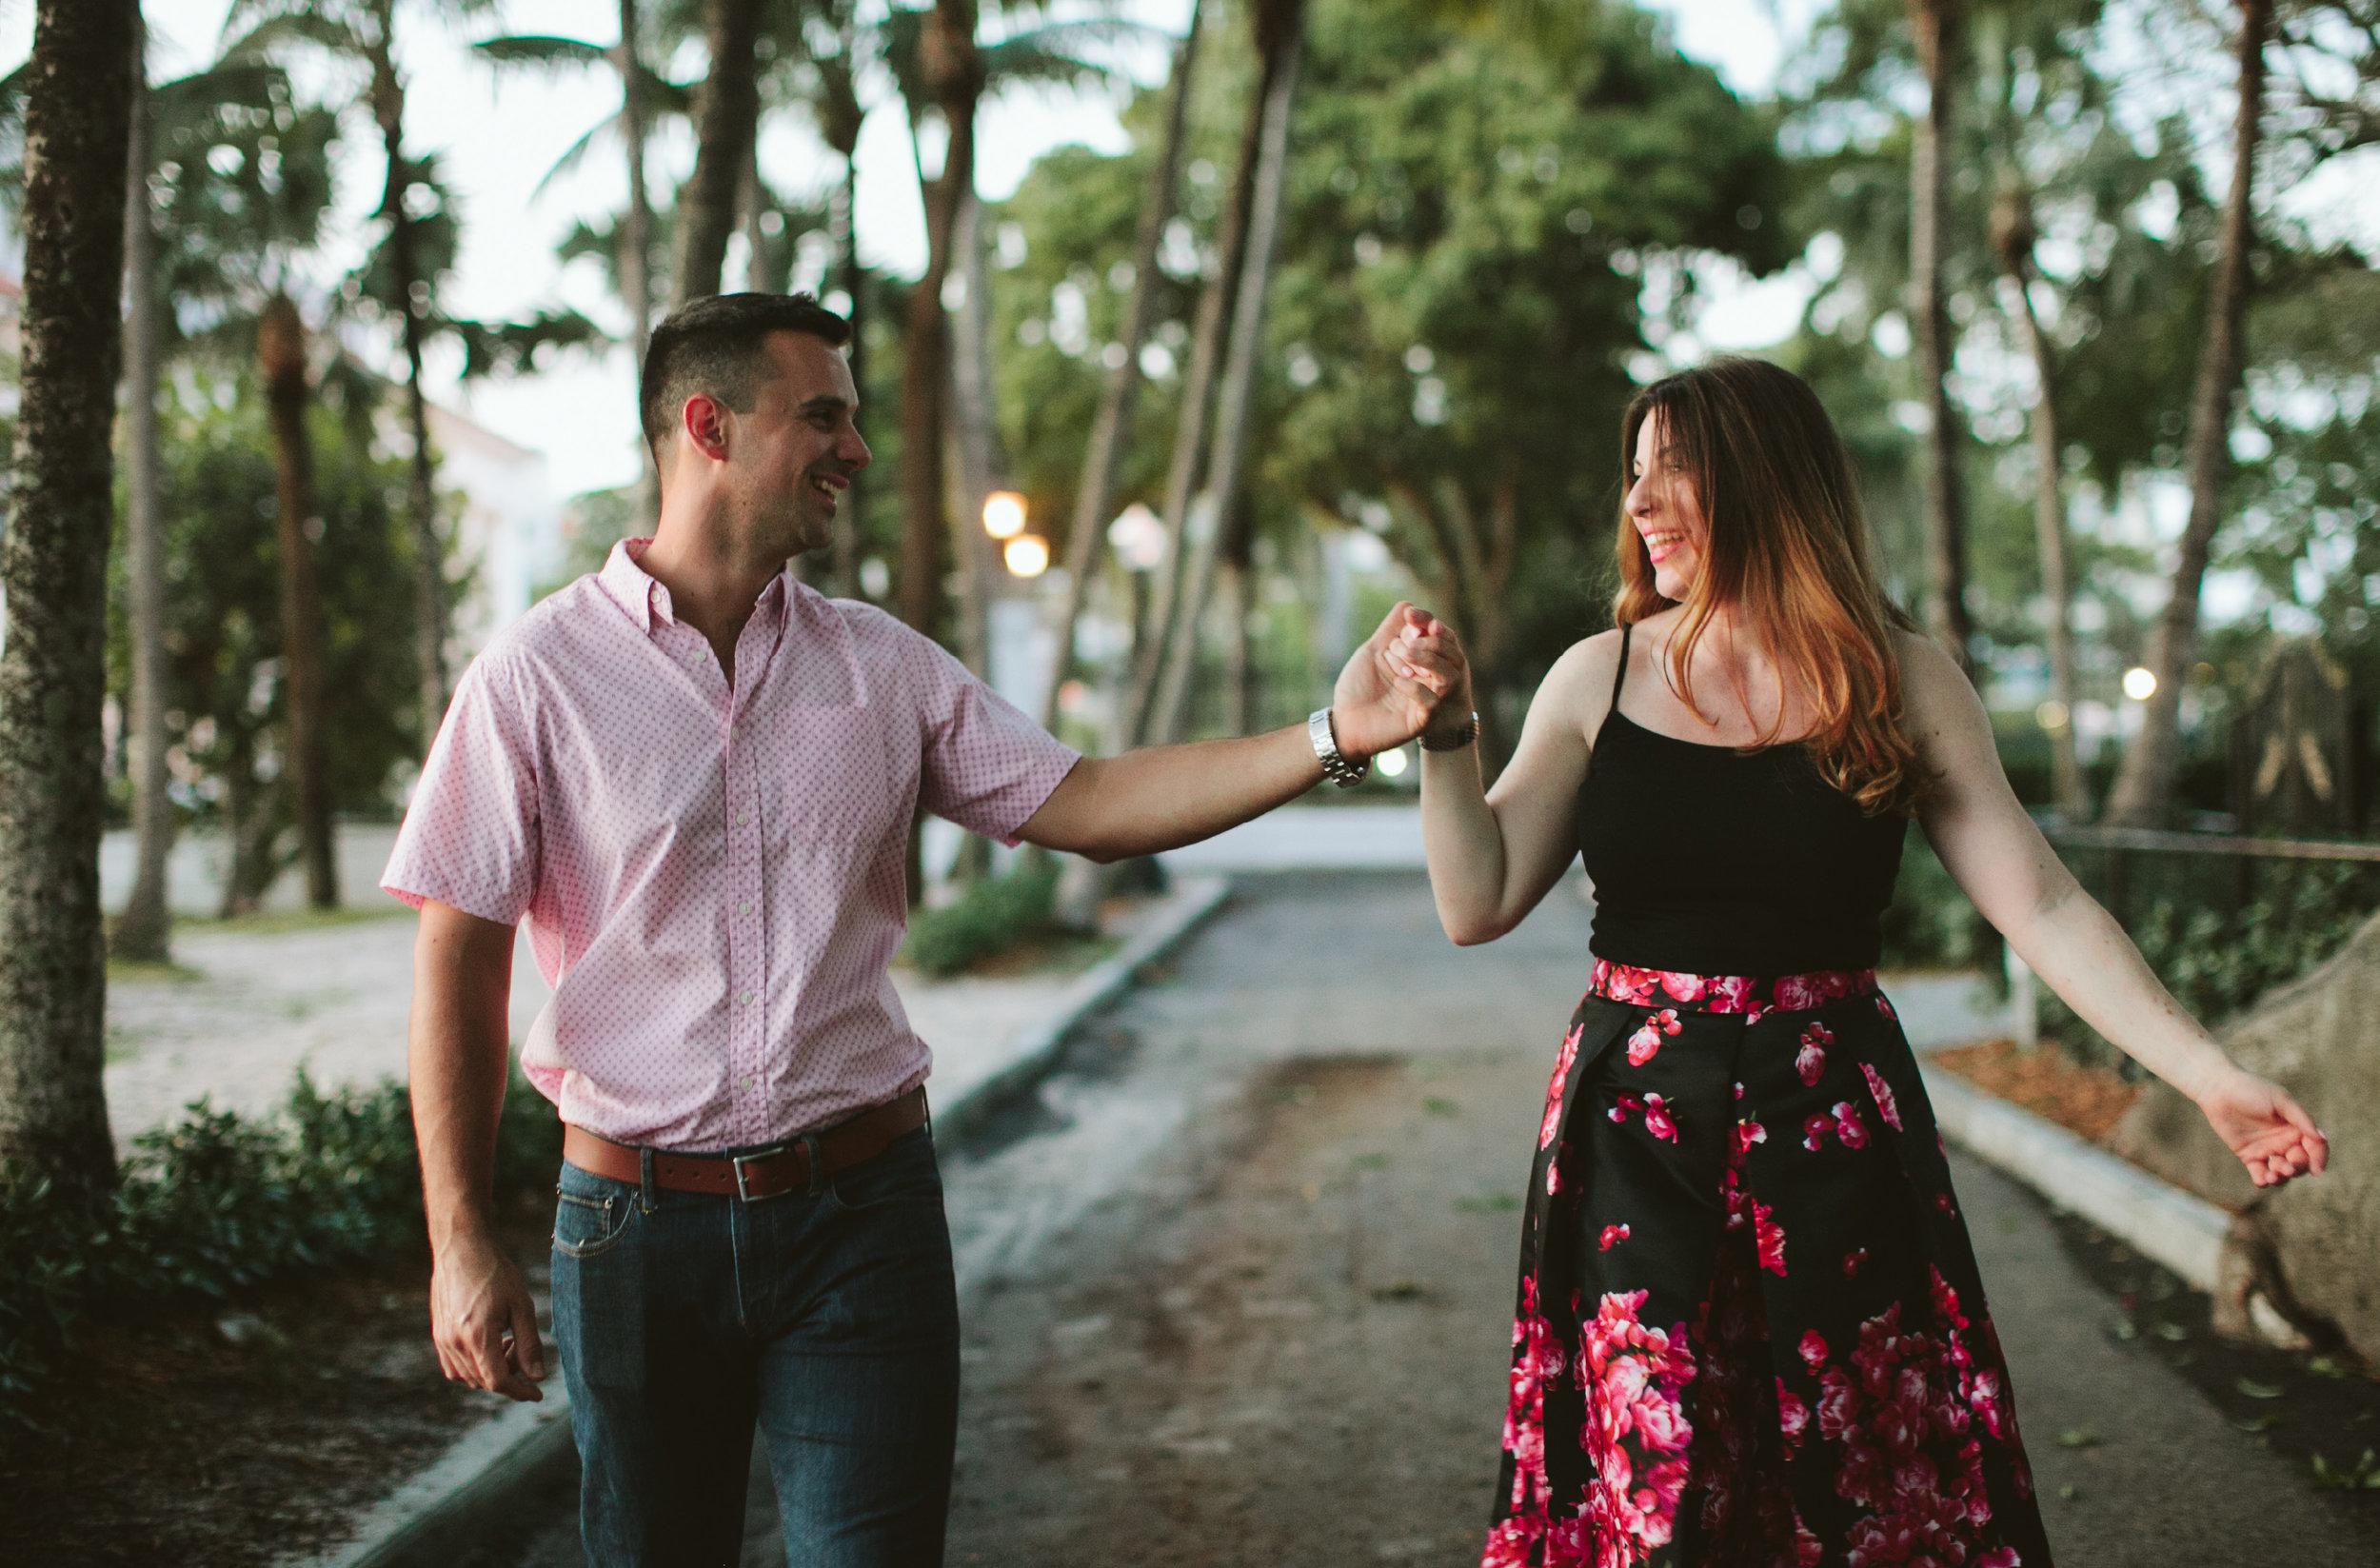 Ida + Danny Surprise Proposal Engagement Shoot at Flagler Museum Palm Beach10.jpg